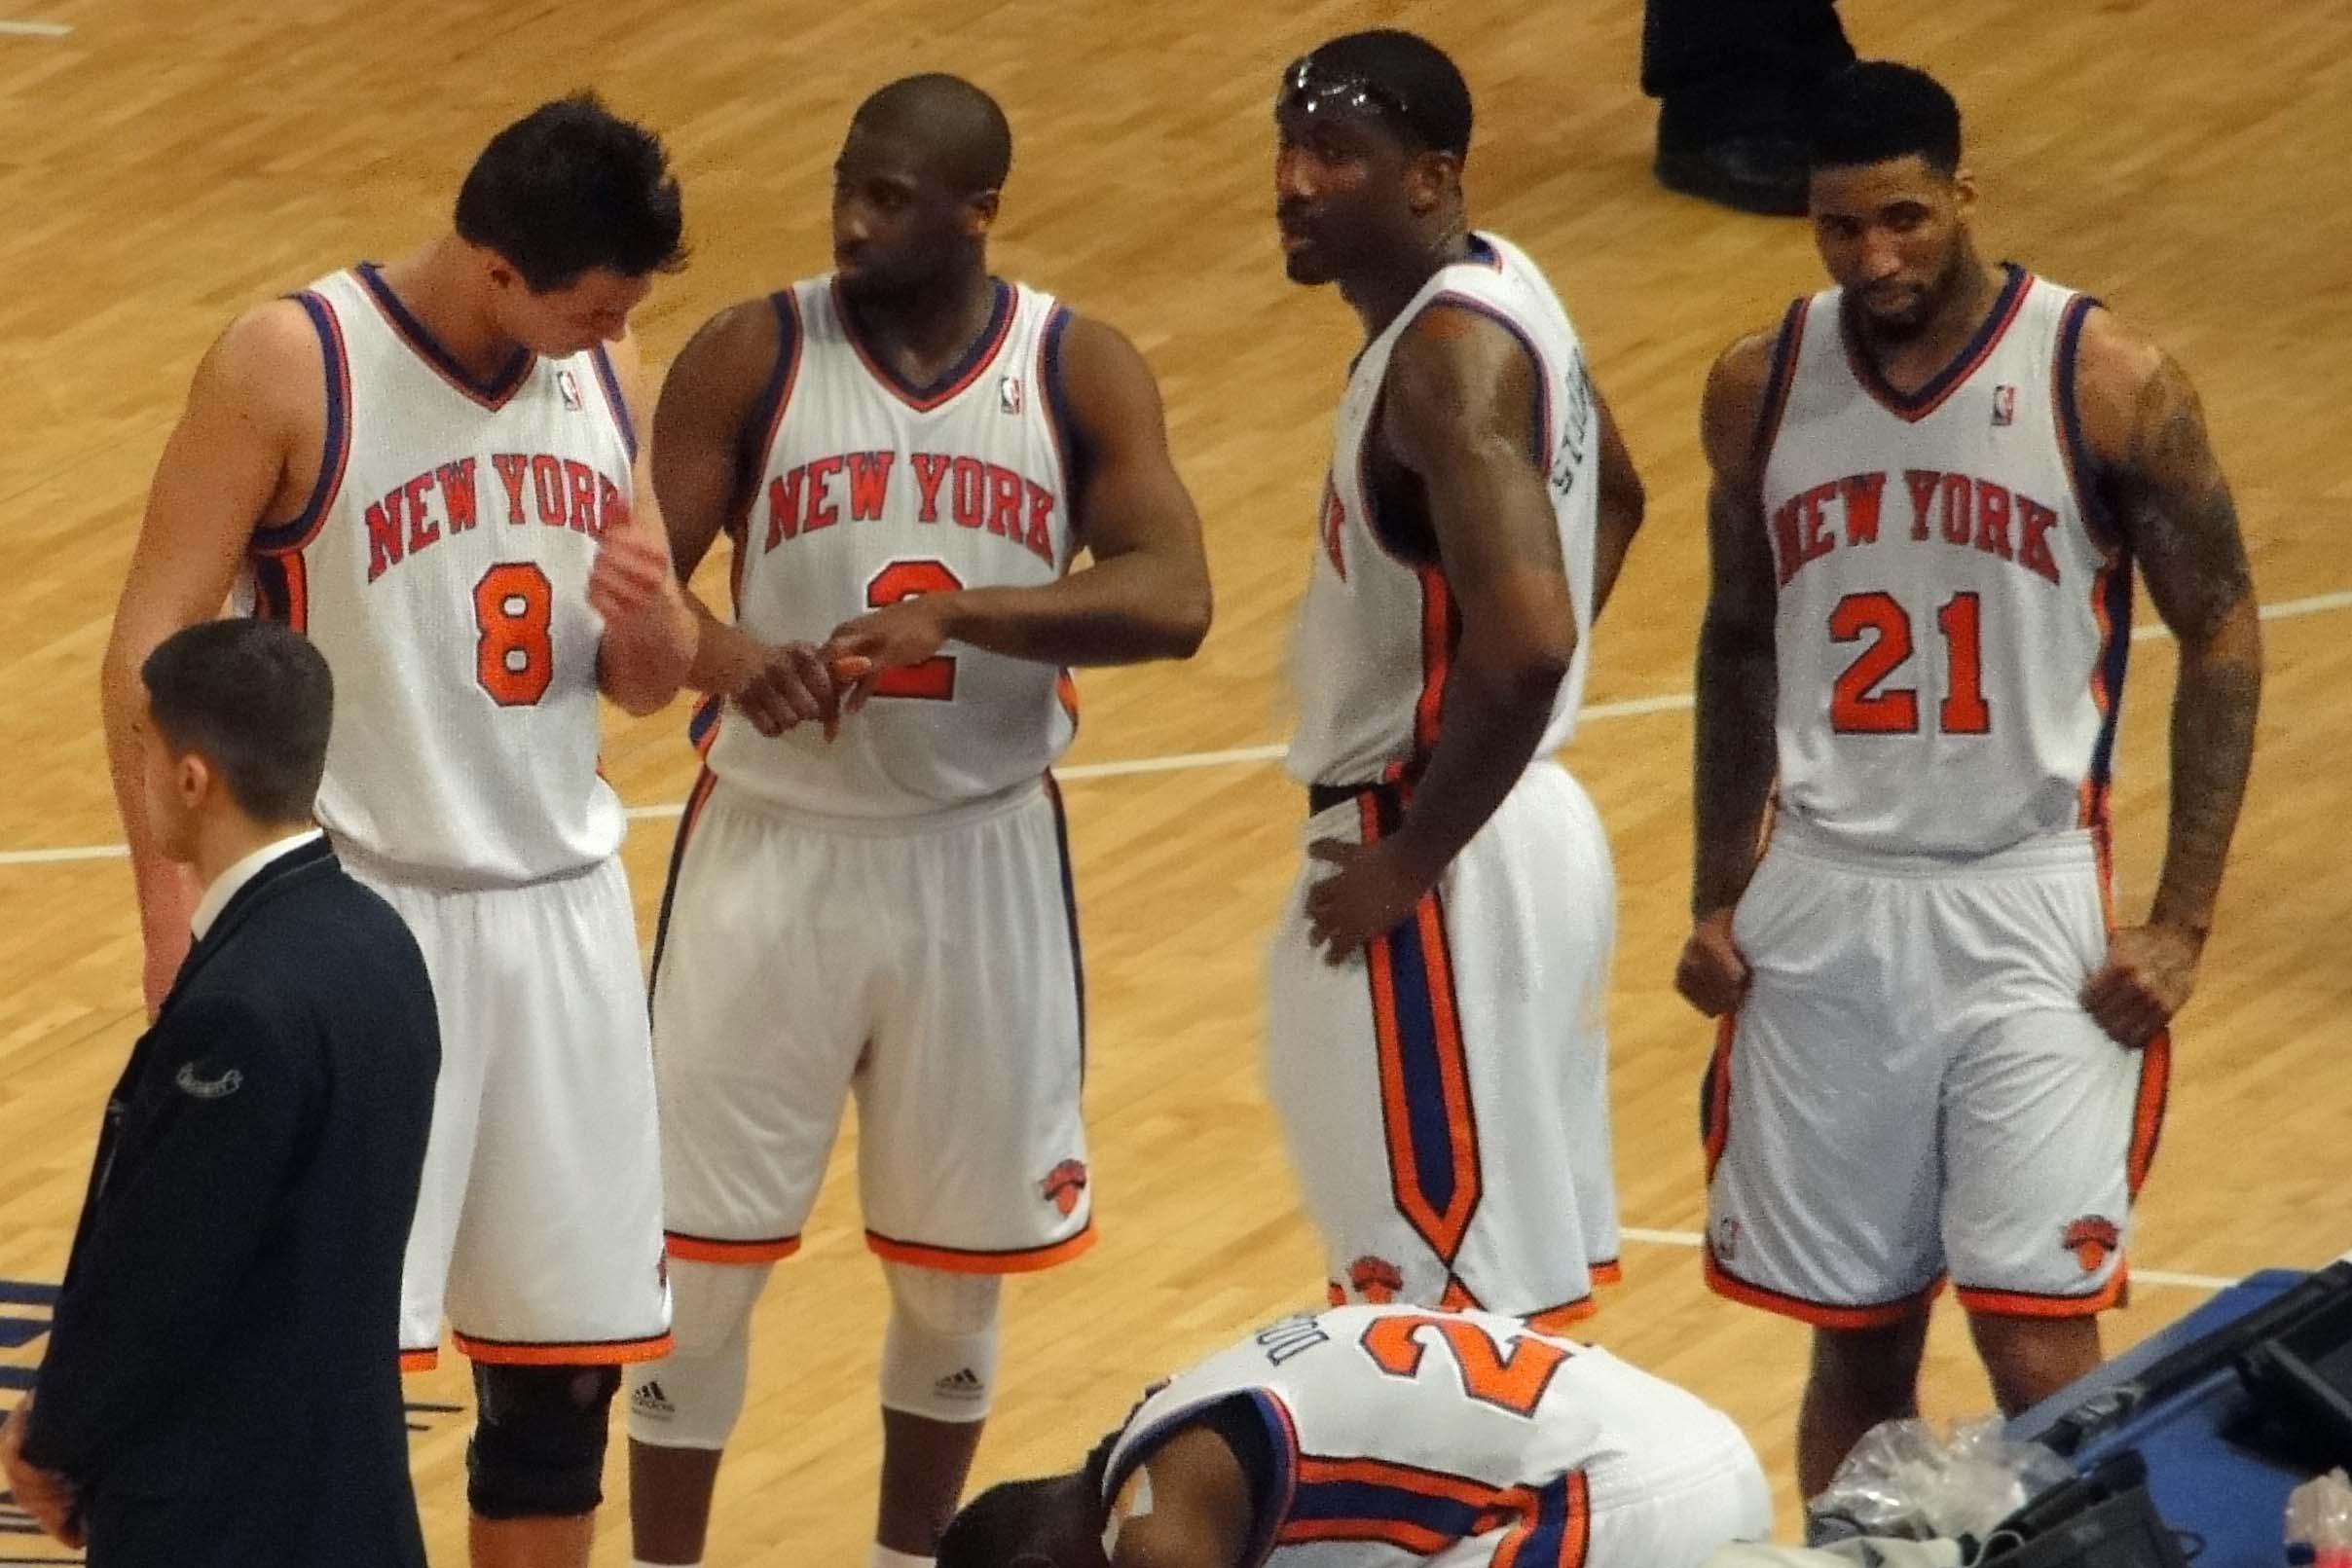 NY Knicks players Raymond Felton, Danilo Gallinari, Wilson Chandler, Amar'e Stoudemire and Toney Douglas during a game against Miami Heat.